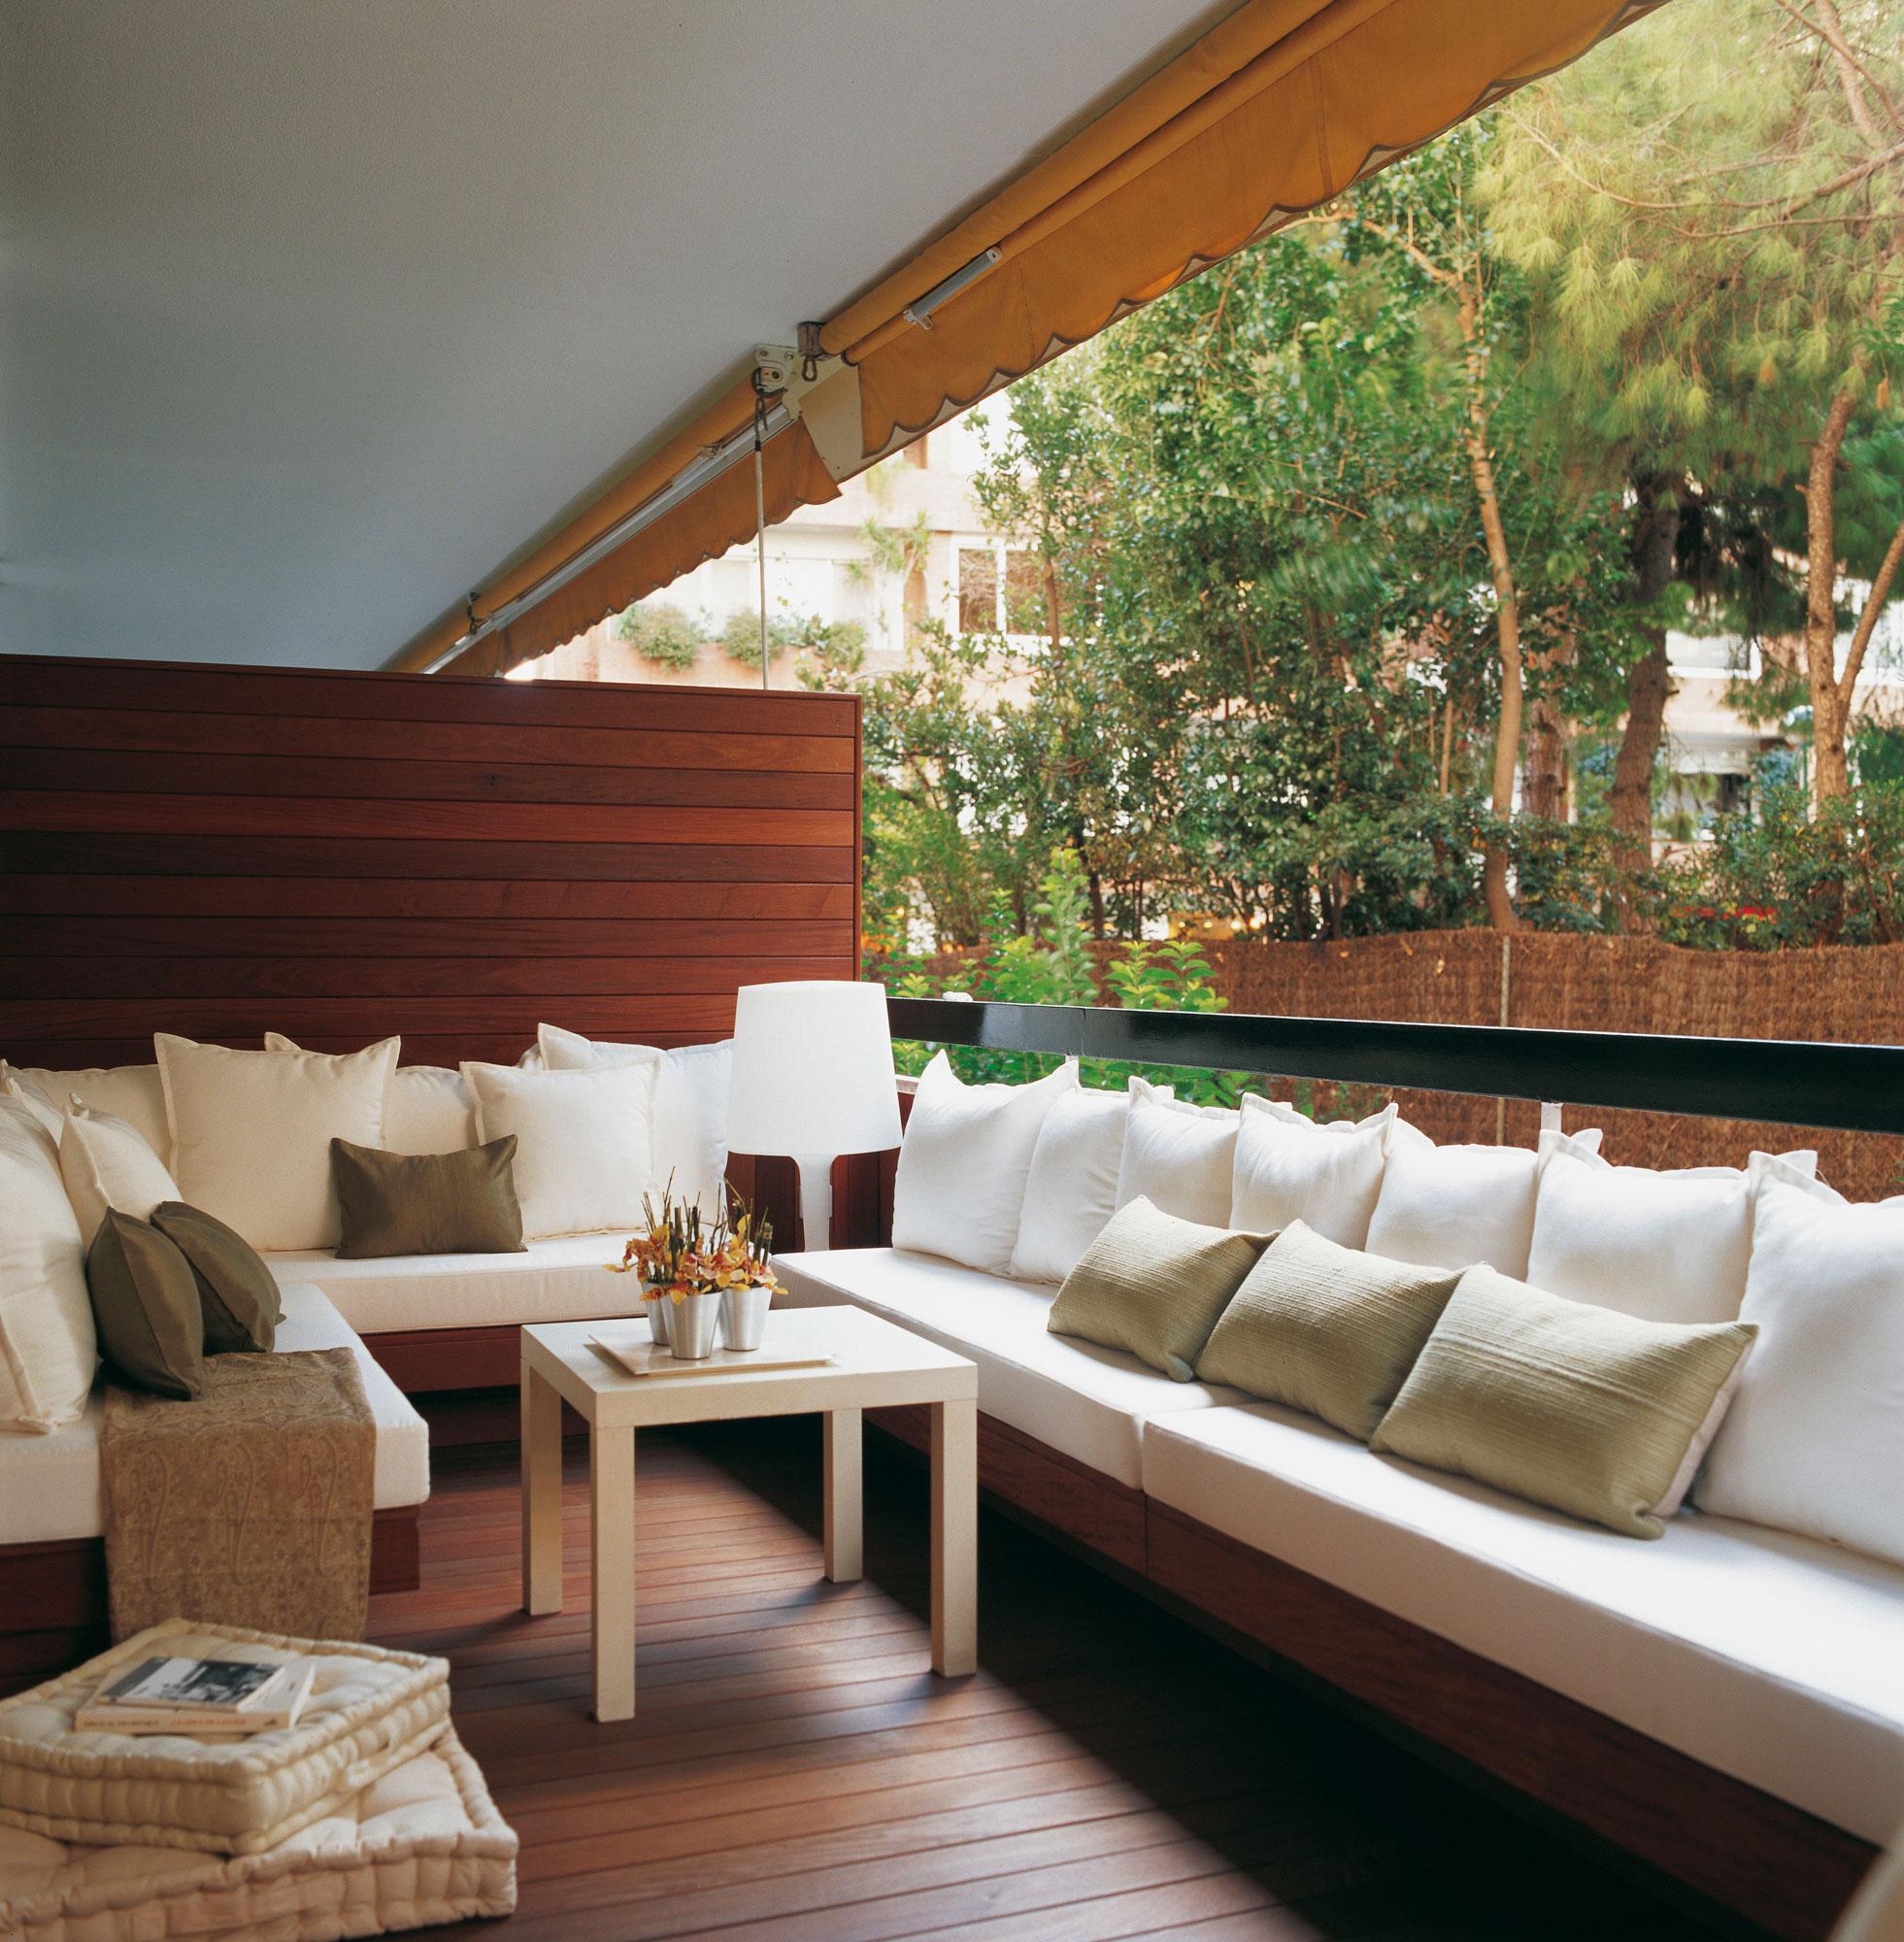 Suelos de madera natural y tarima sint tica para exterior for Sofa terraza madera